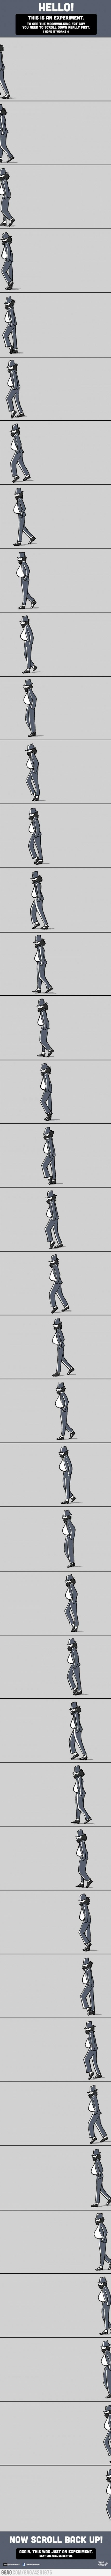 #scroll experiment #moonwalk